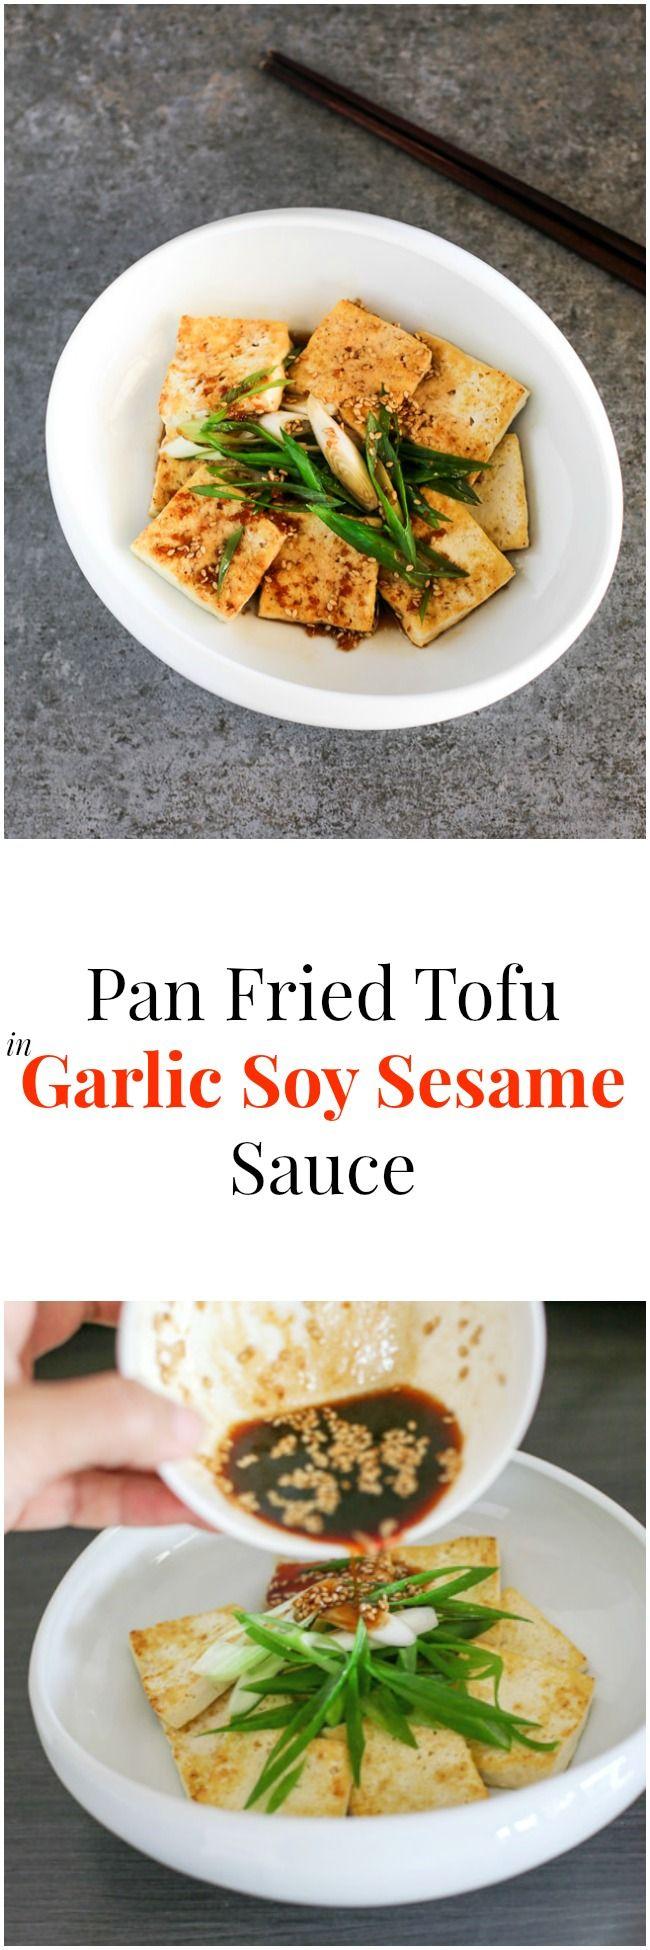 pan fried tofu in garlic soy sesame sauce tofu recipes korean recipes ...